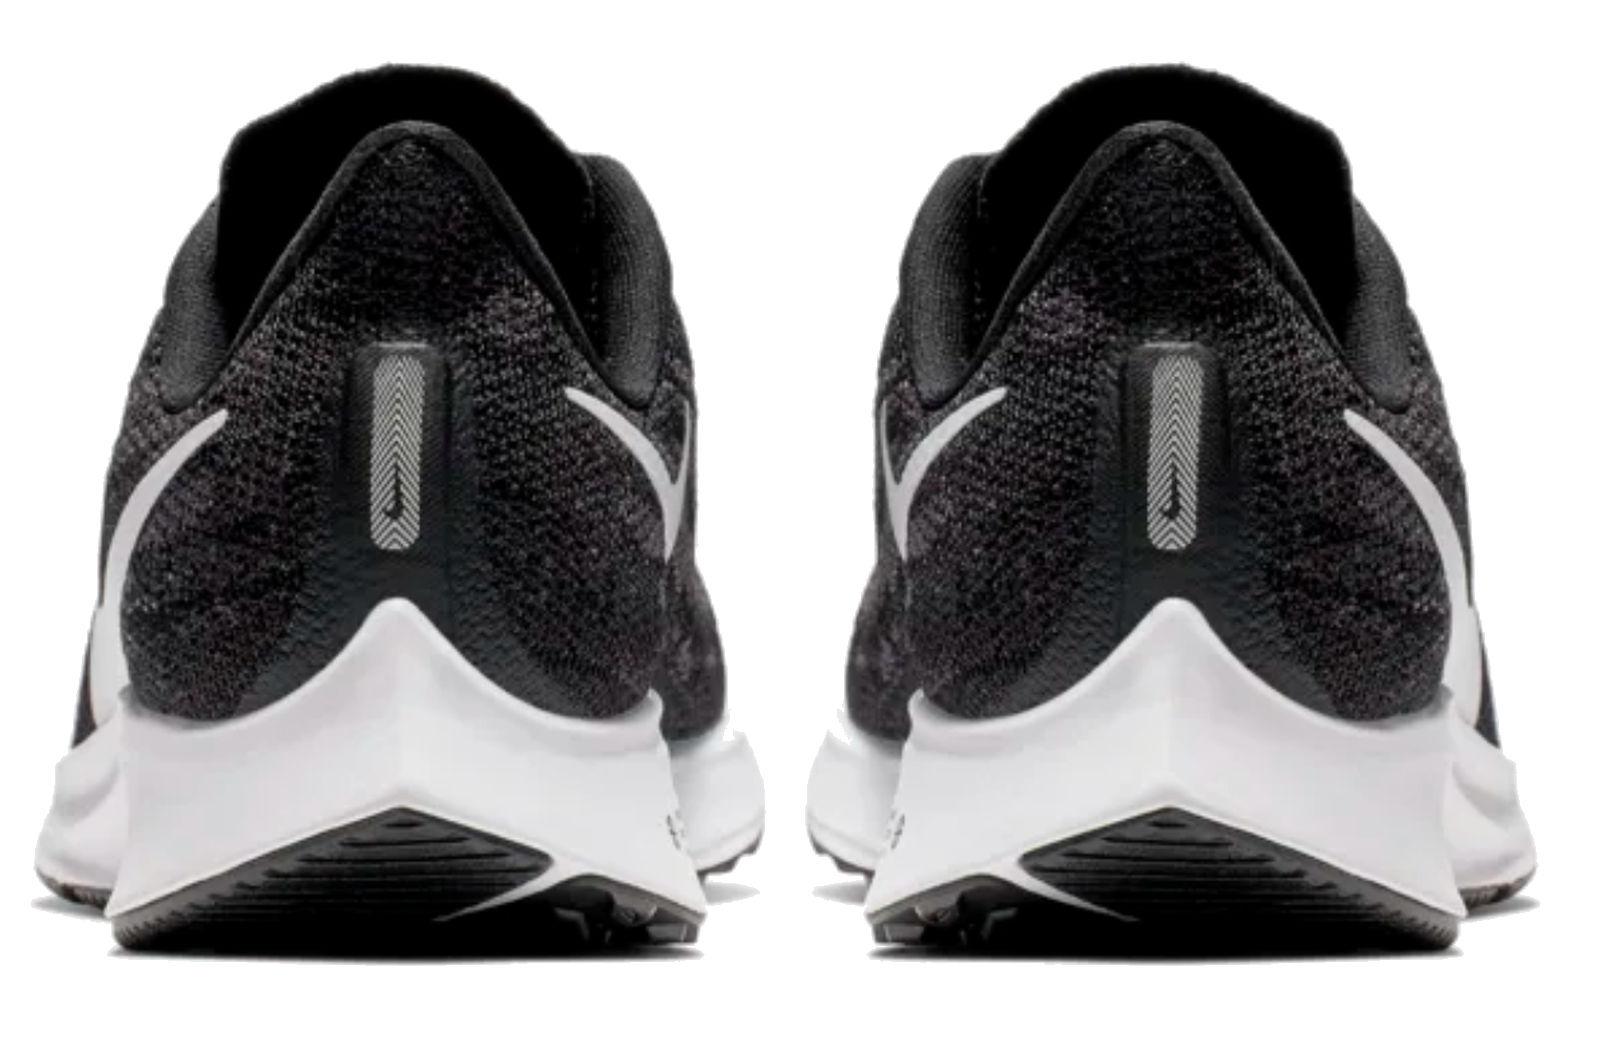 Details about Nike Women's Running Shoes Trail Lightweight Nike Air Zoom  Pegasus 36 W Black- show original title